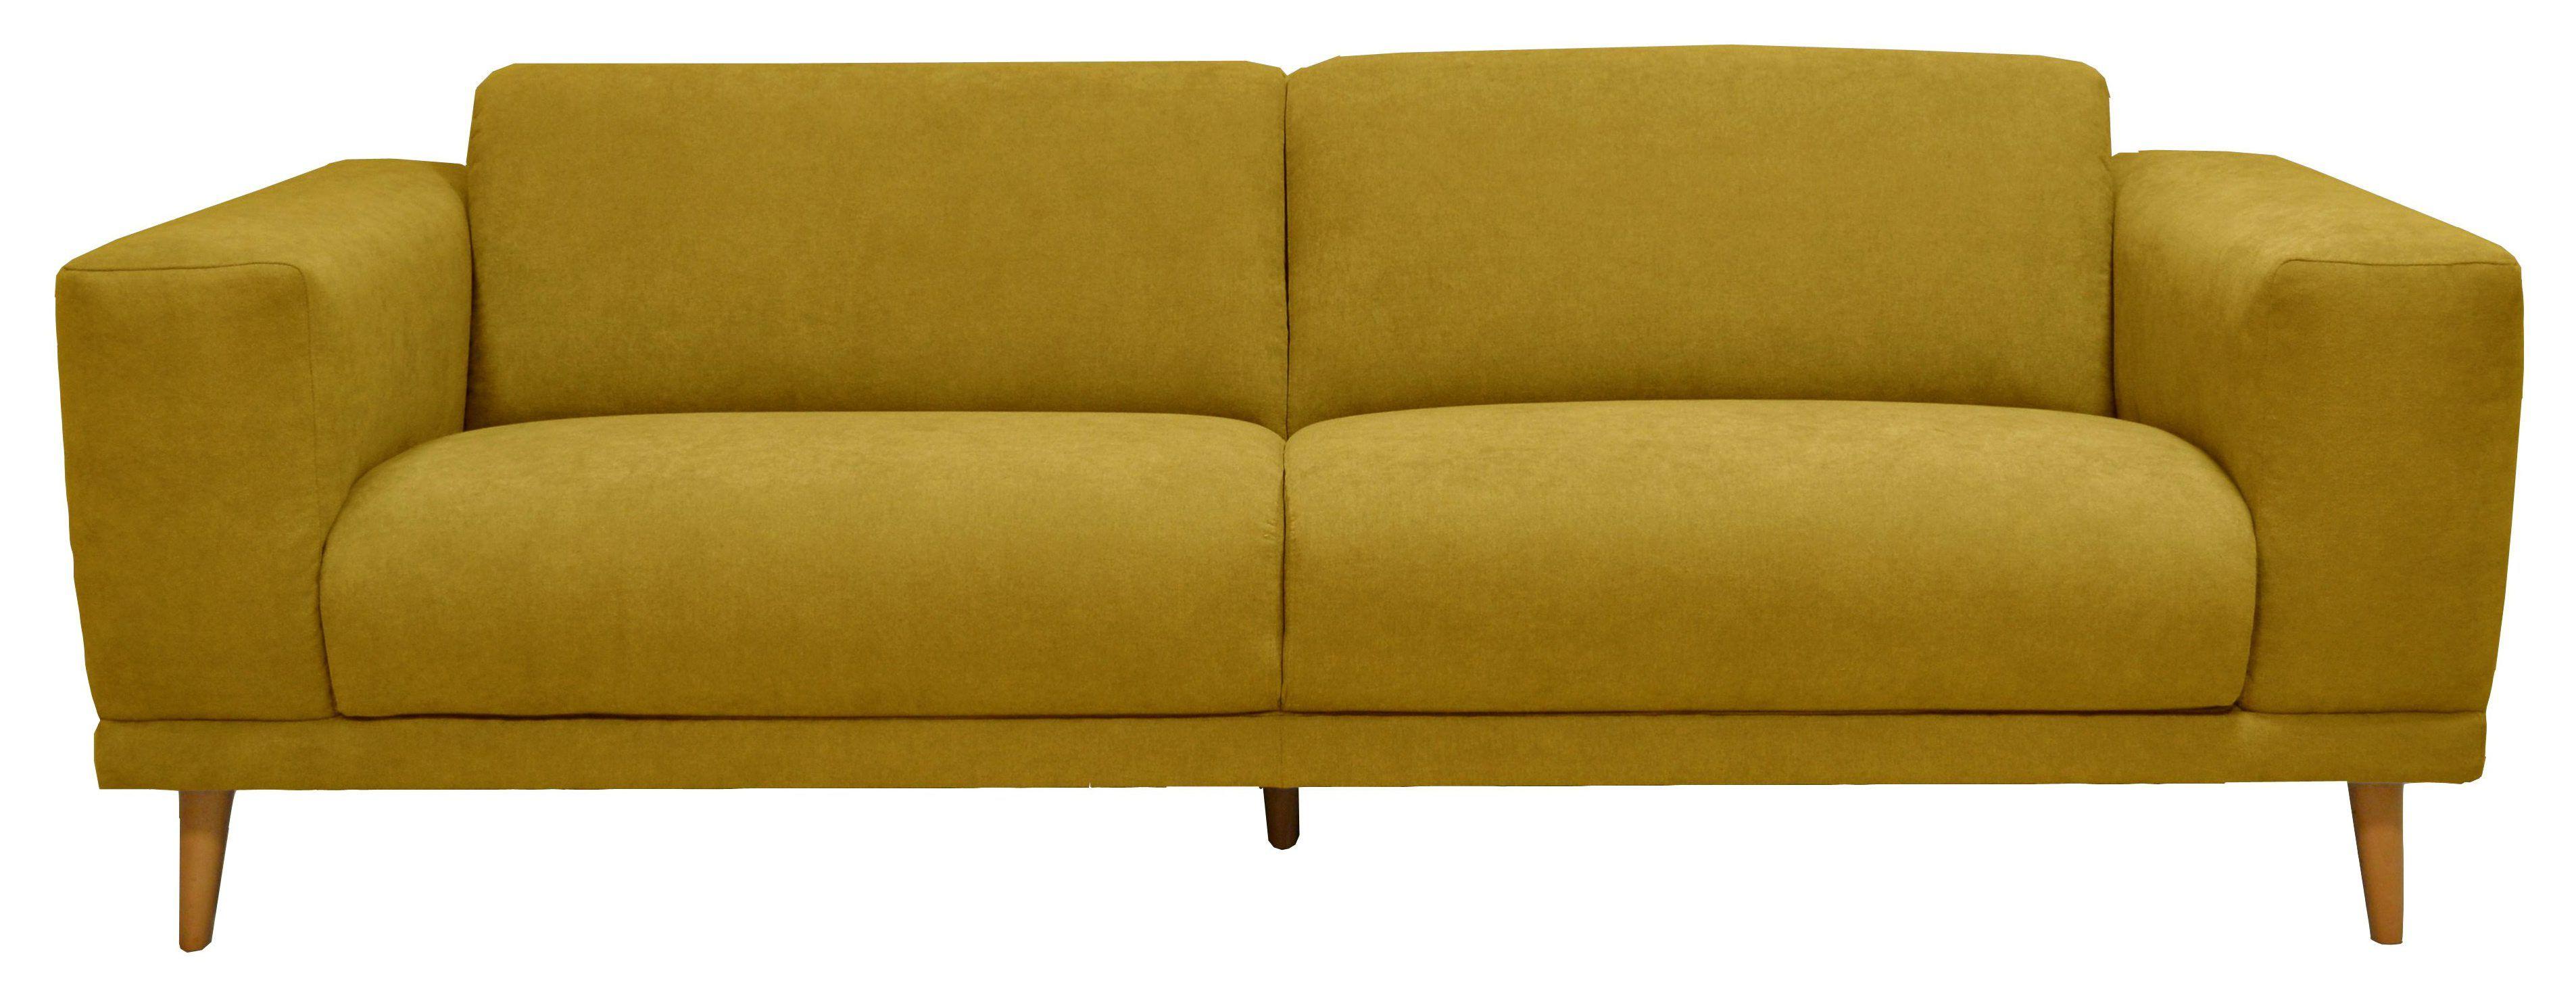 canap 3 places oslo tissu gentiane en 2019 jungle deco deco yellow et home. Black Bedroom Furniture Sets. Home Design Ideas